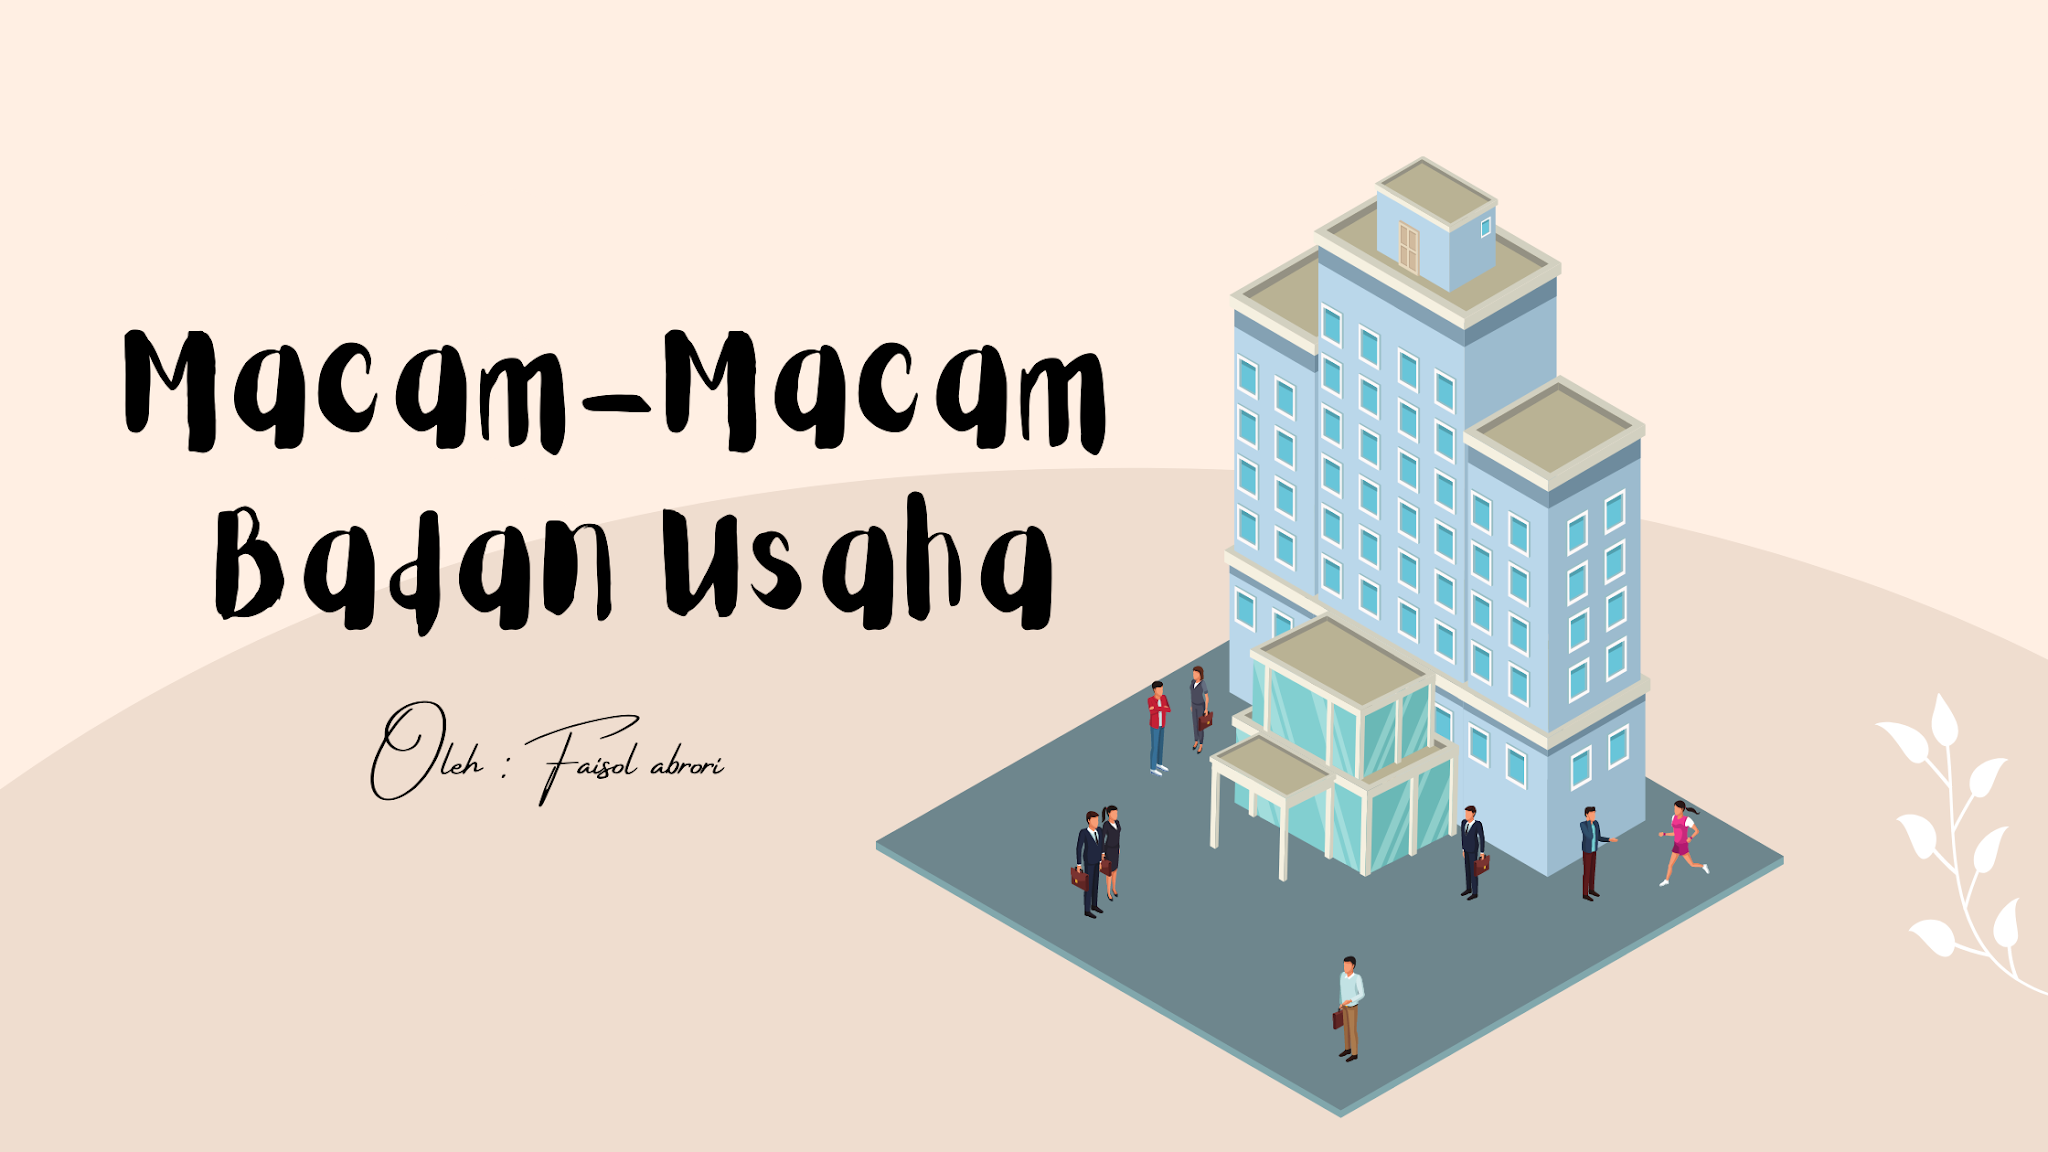 Macam-Macam Badan Usaha di Indonesia